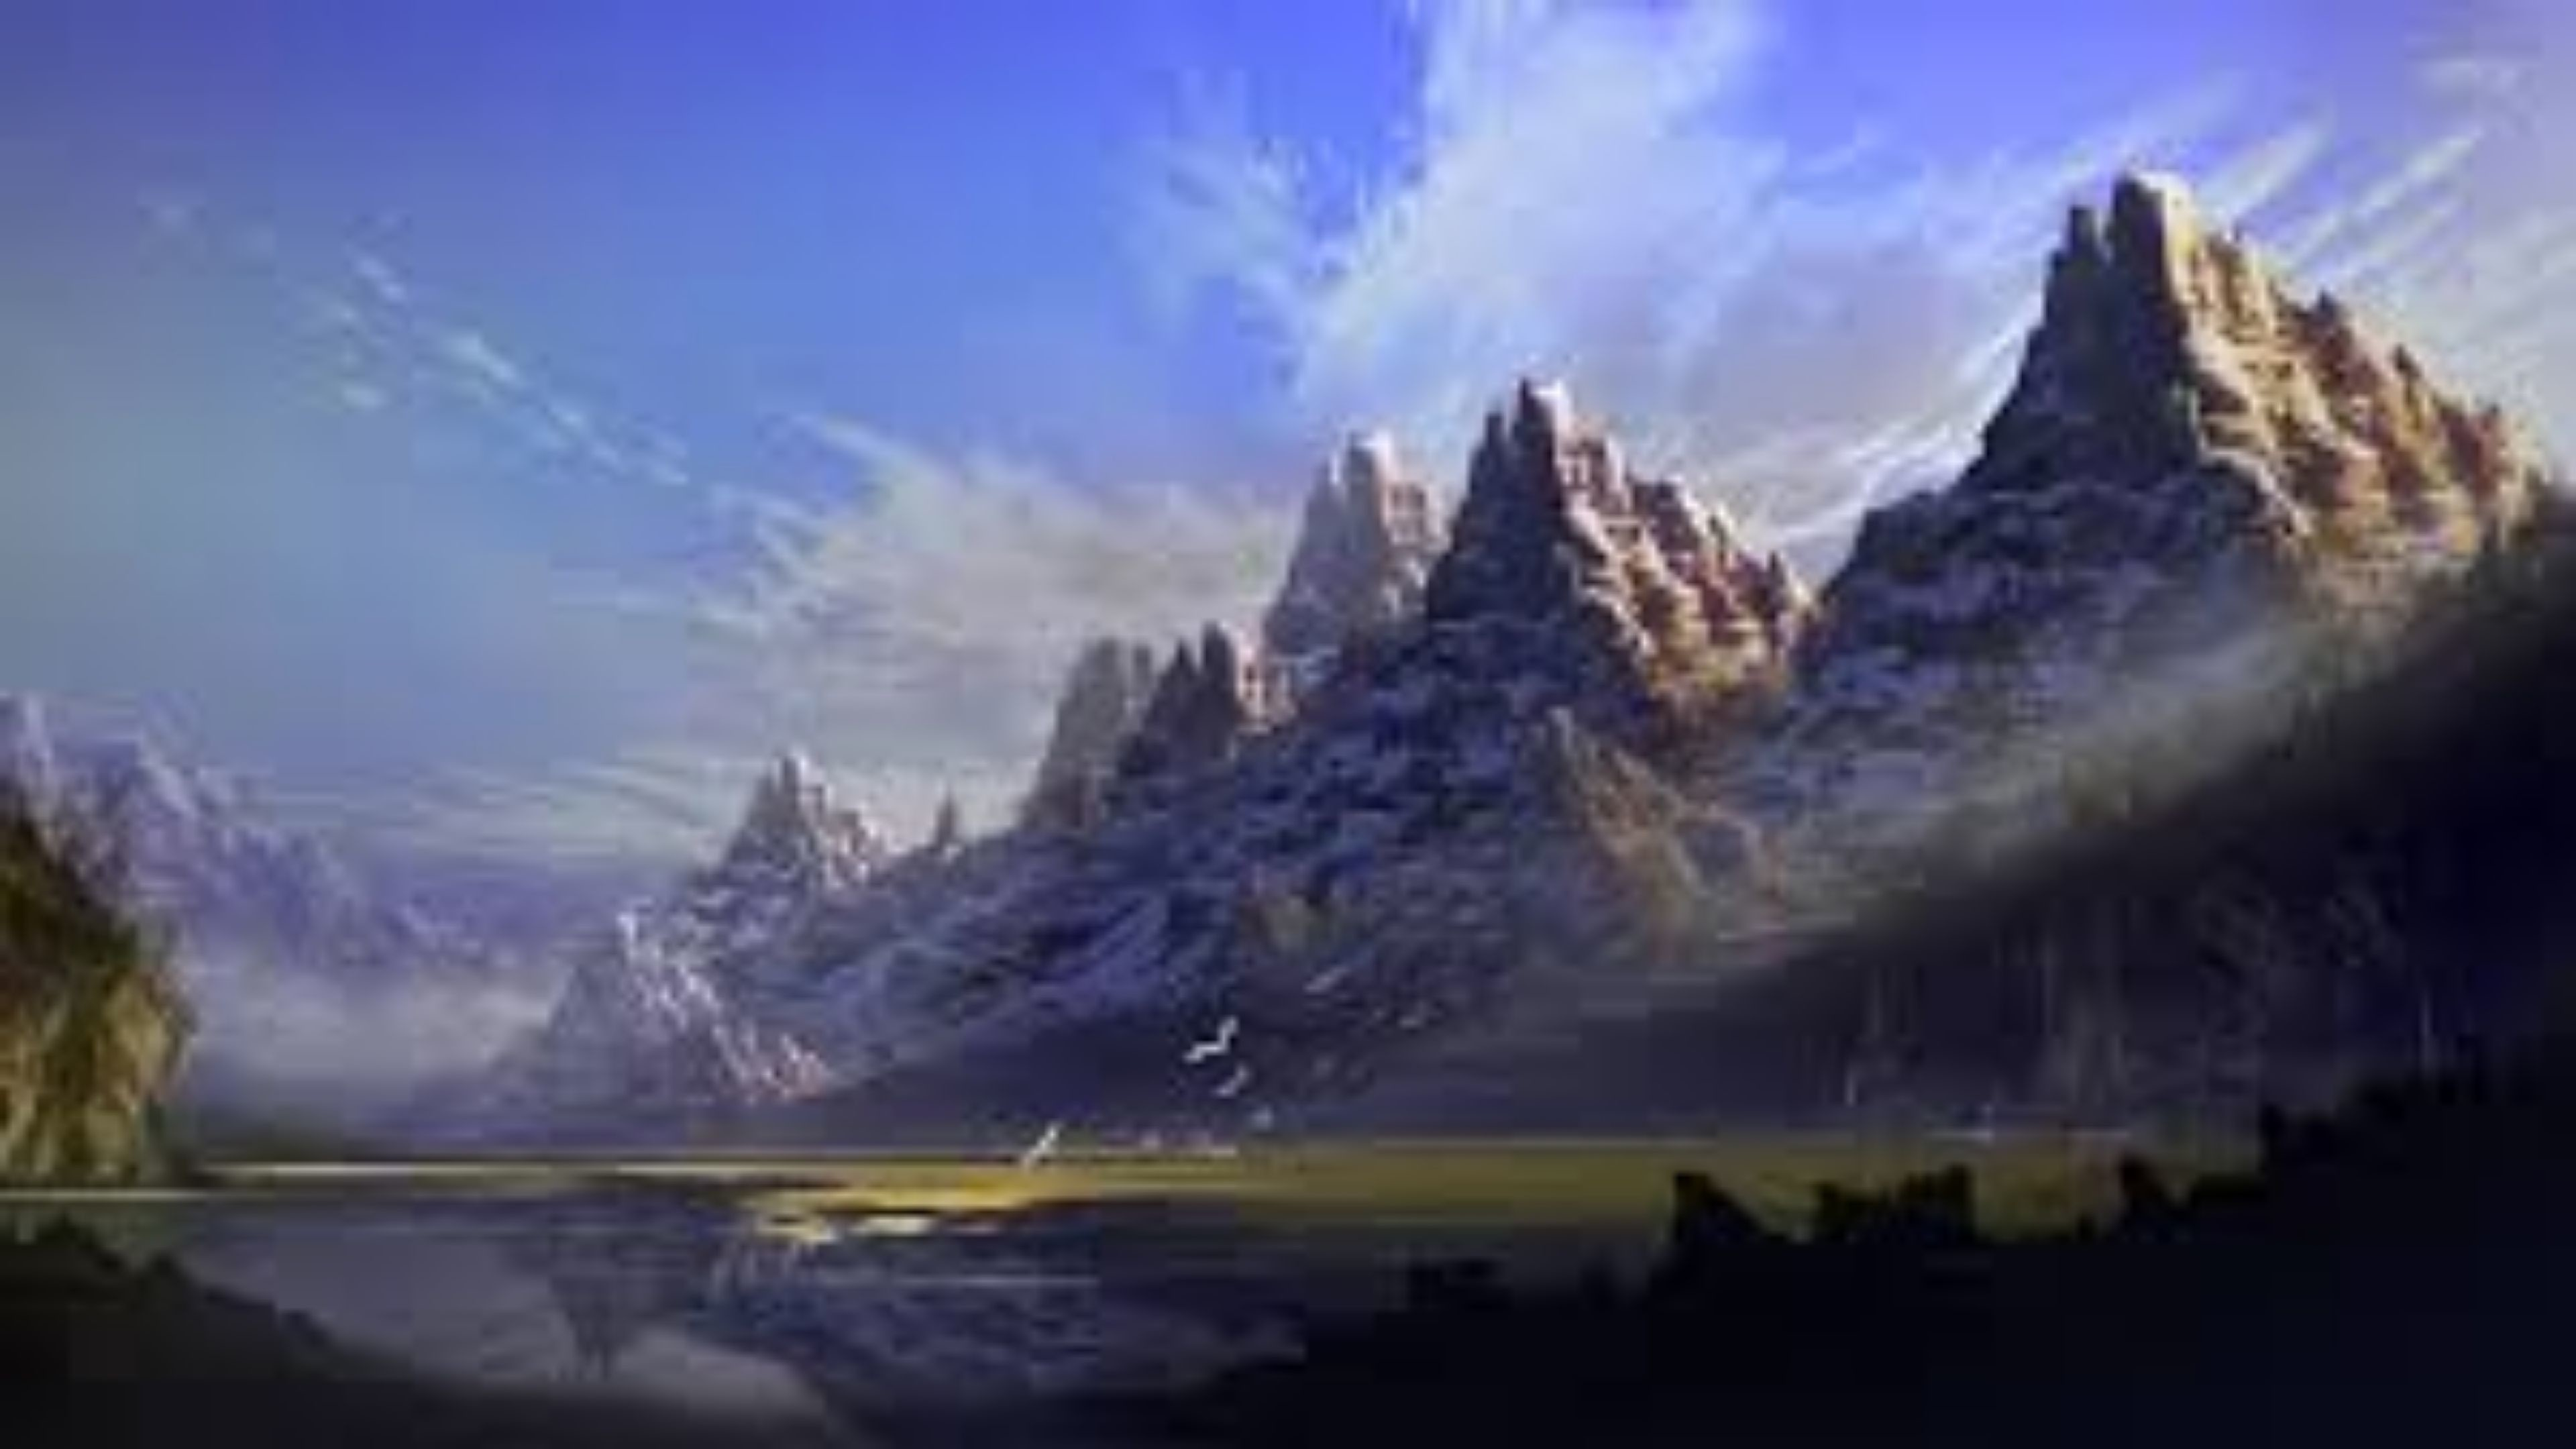 Filename: Great-Mountains-4K-Wallpaper.jpg